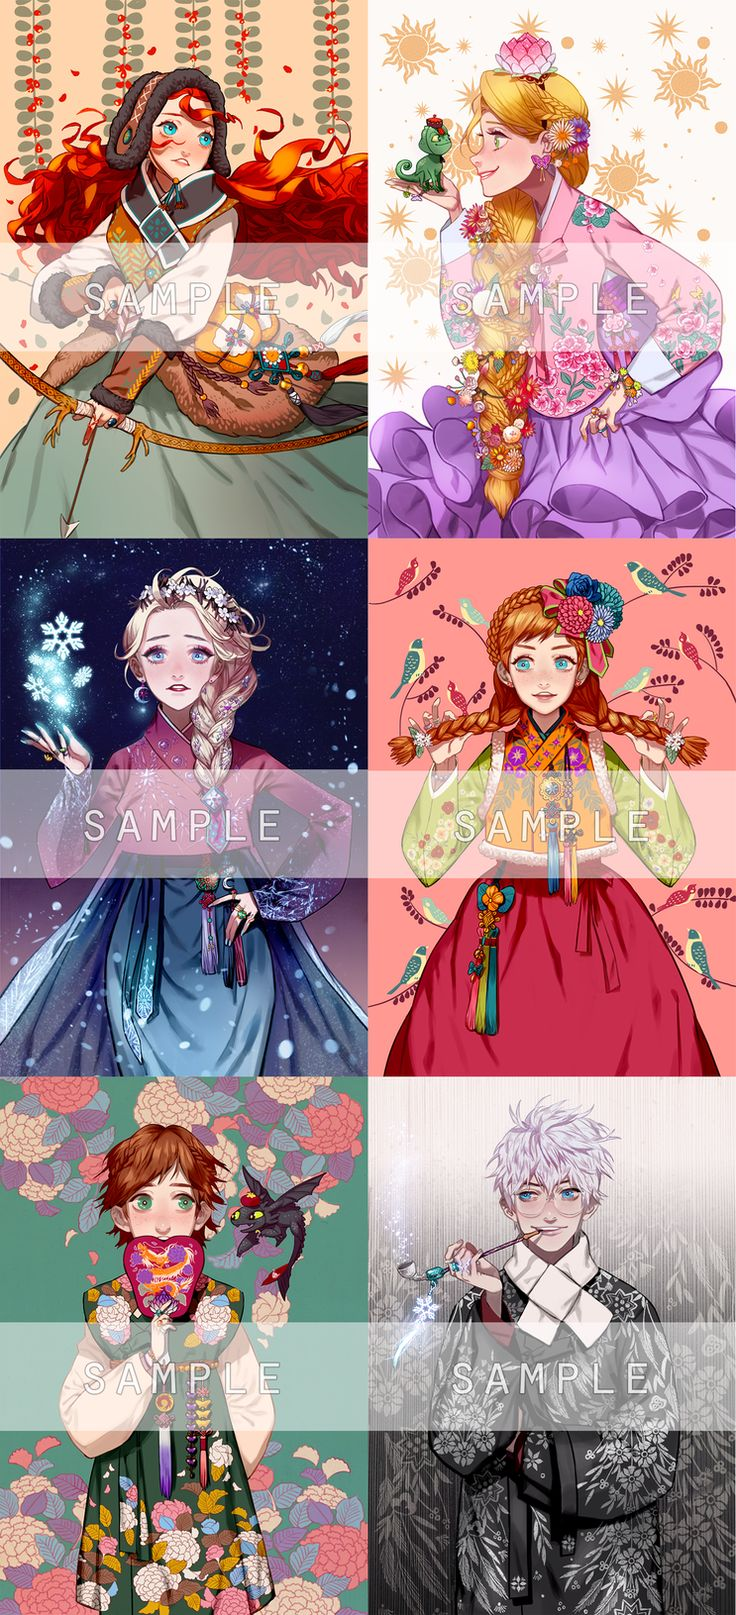 Talented Artist Draws Disney Princesses in Korean Hanboks 엘사안나+빅포 한복 6종세트 통판 안내 : 네이버 블로그